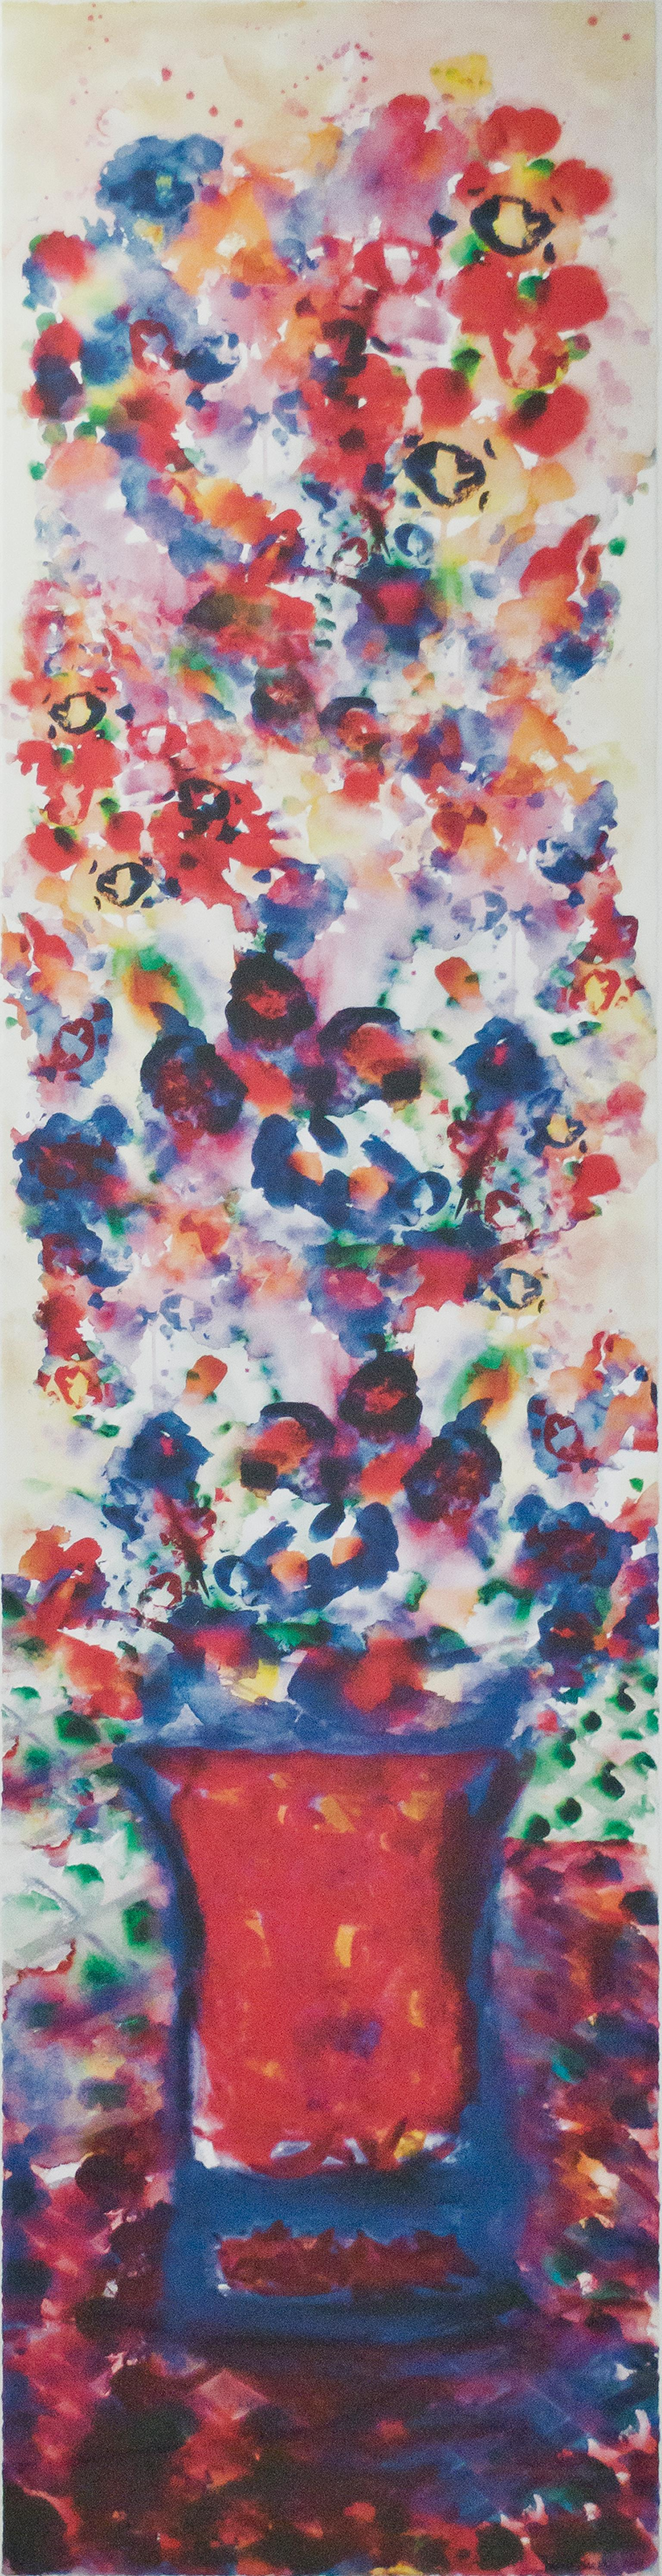 """Morph Dog Fireworks Bouquet,"" Original Print on Paper by David Barnett"